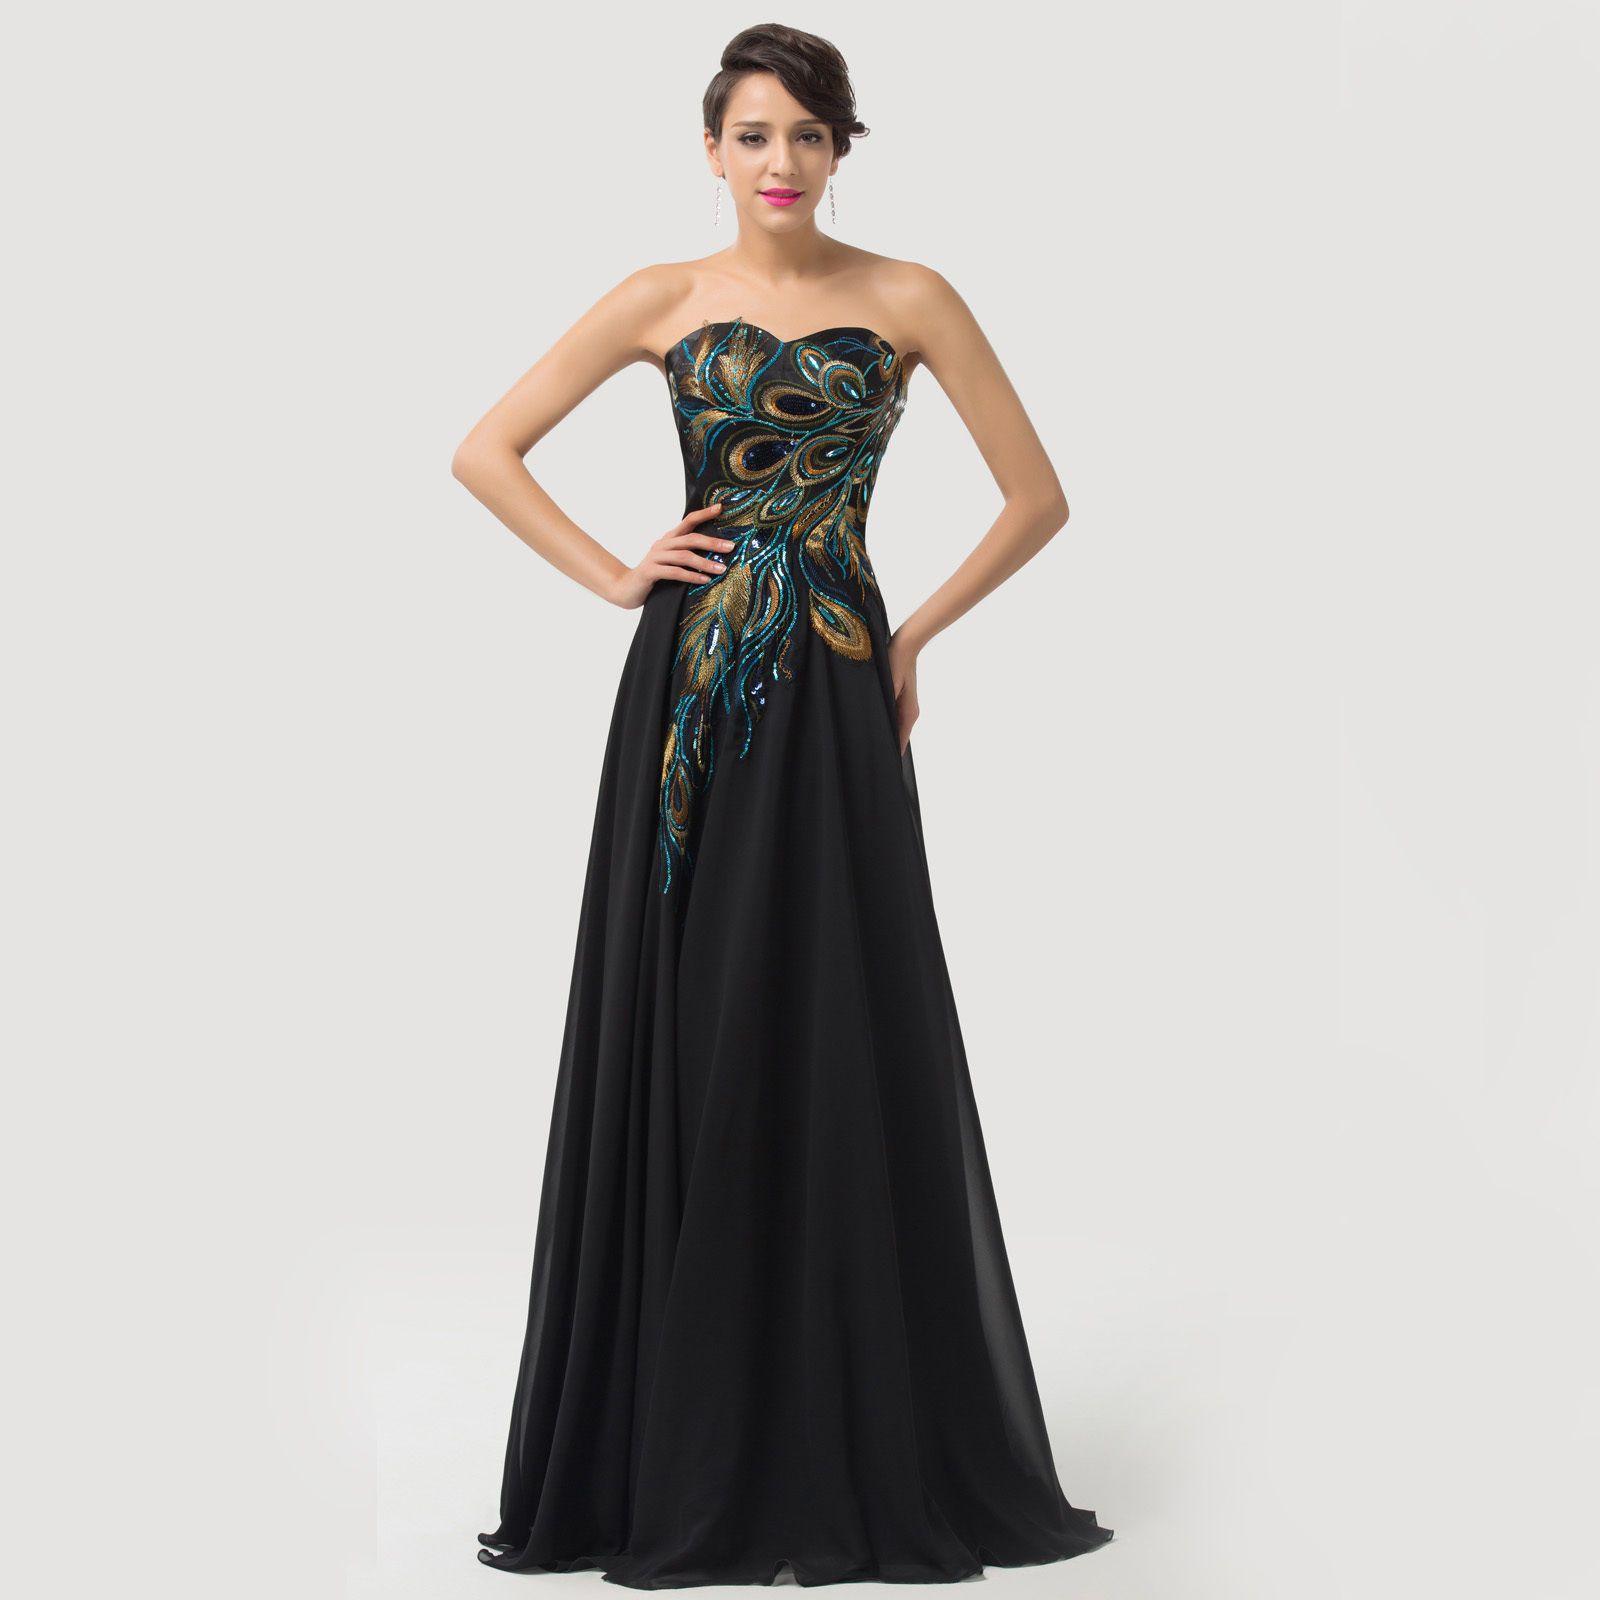 18+ Peacock wedding dress plus size information